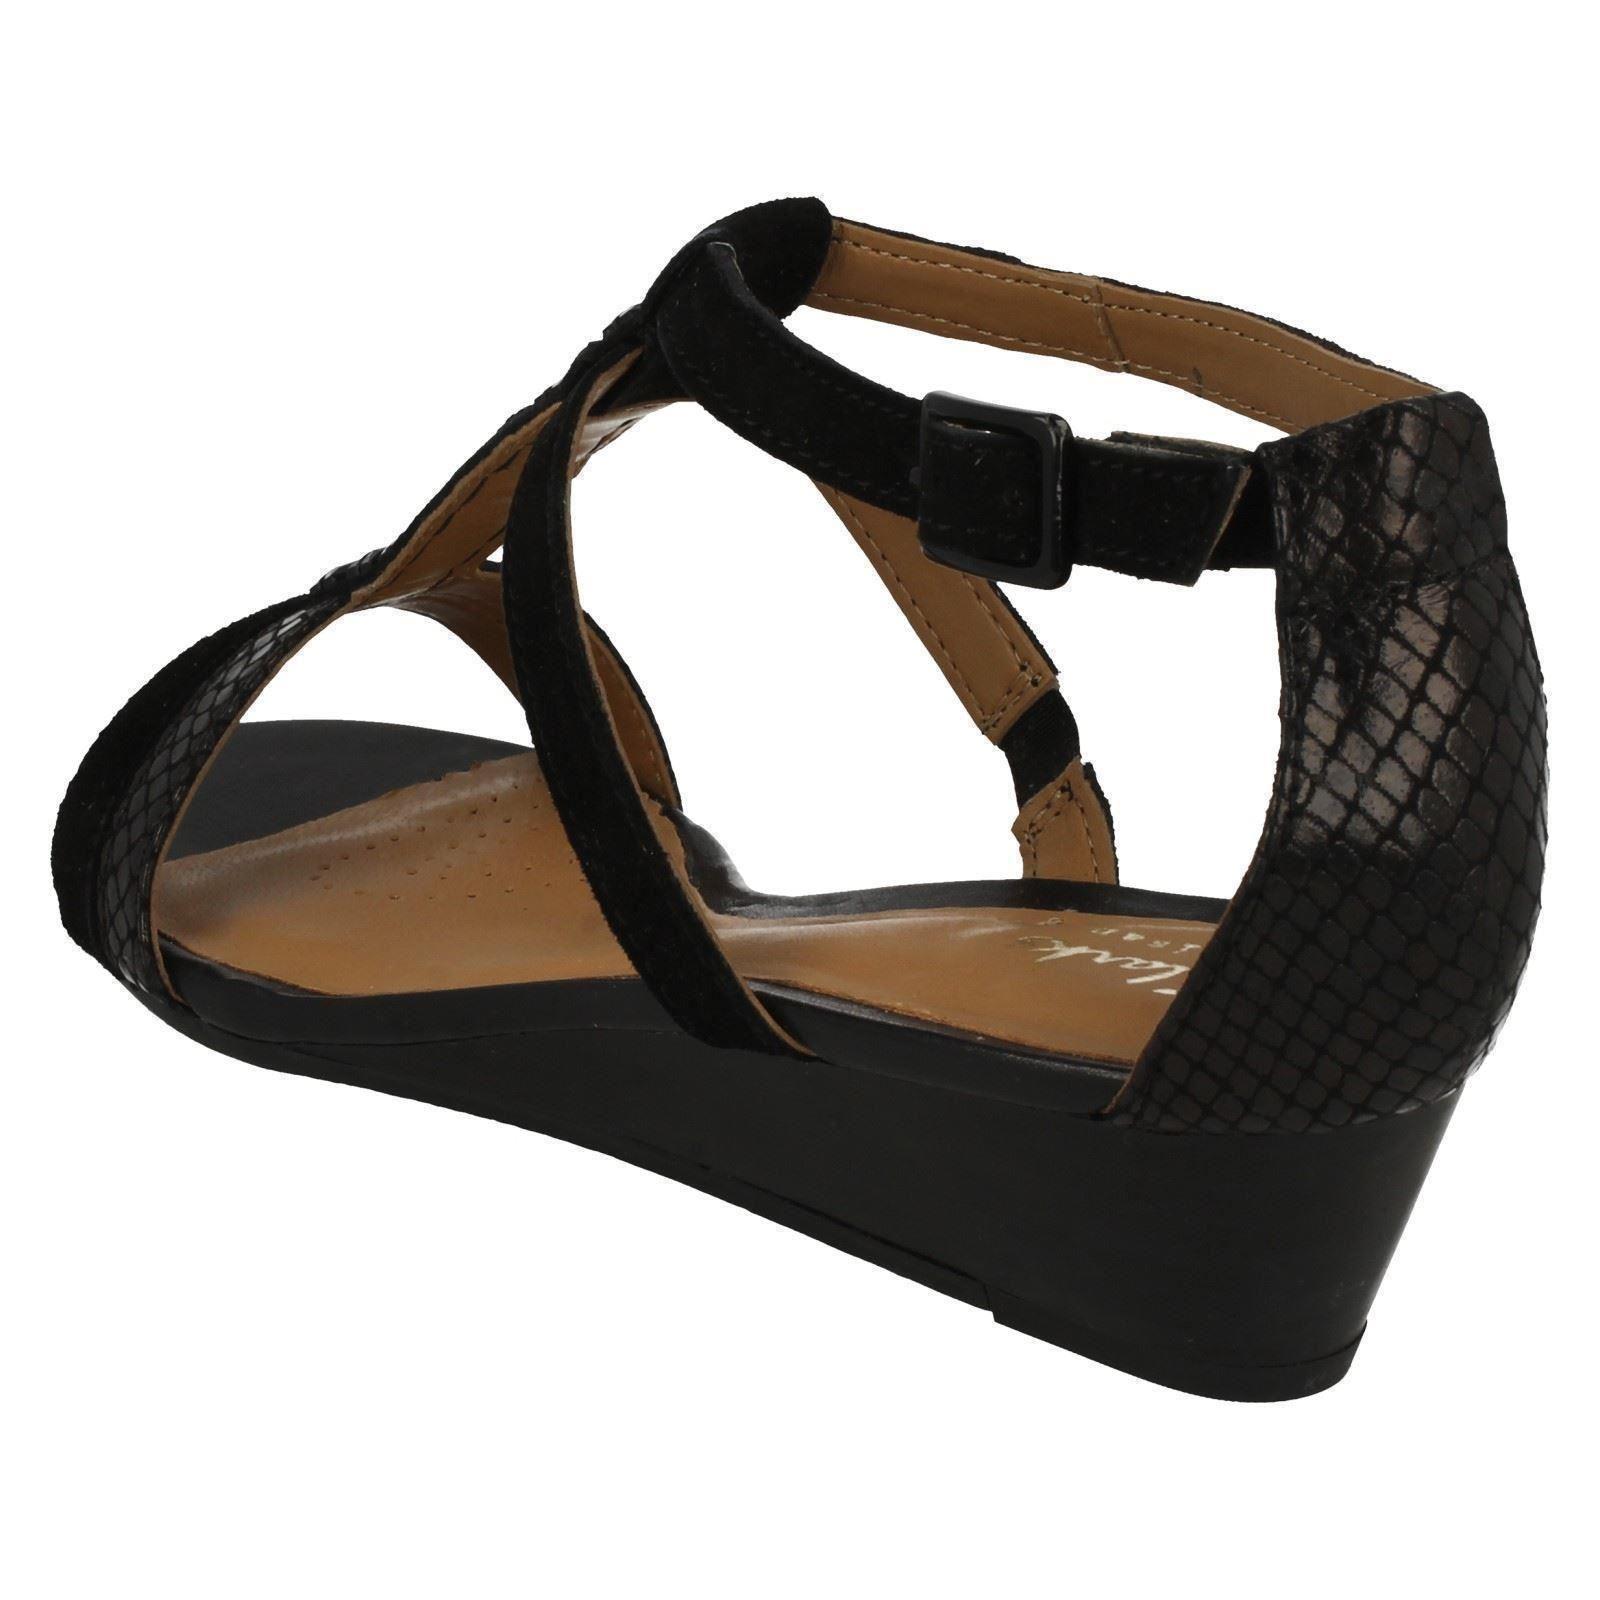 clarks smart wedge sandals playful fox ebay